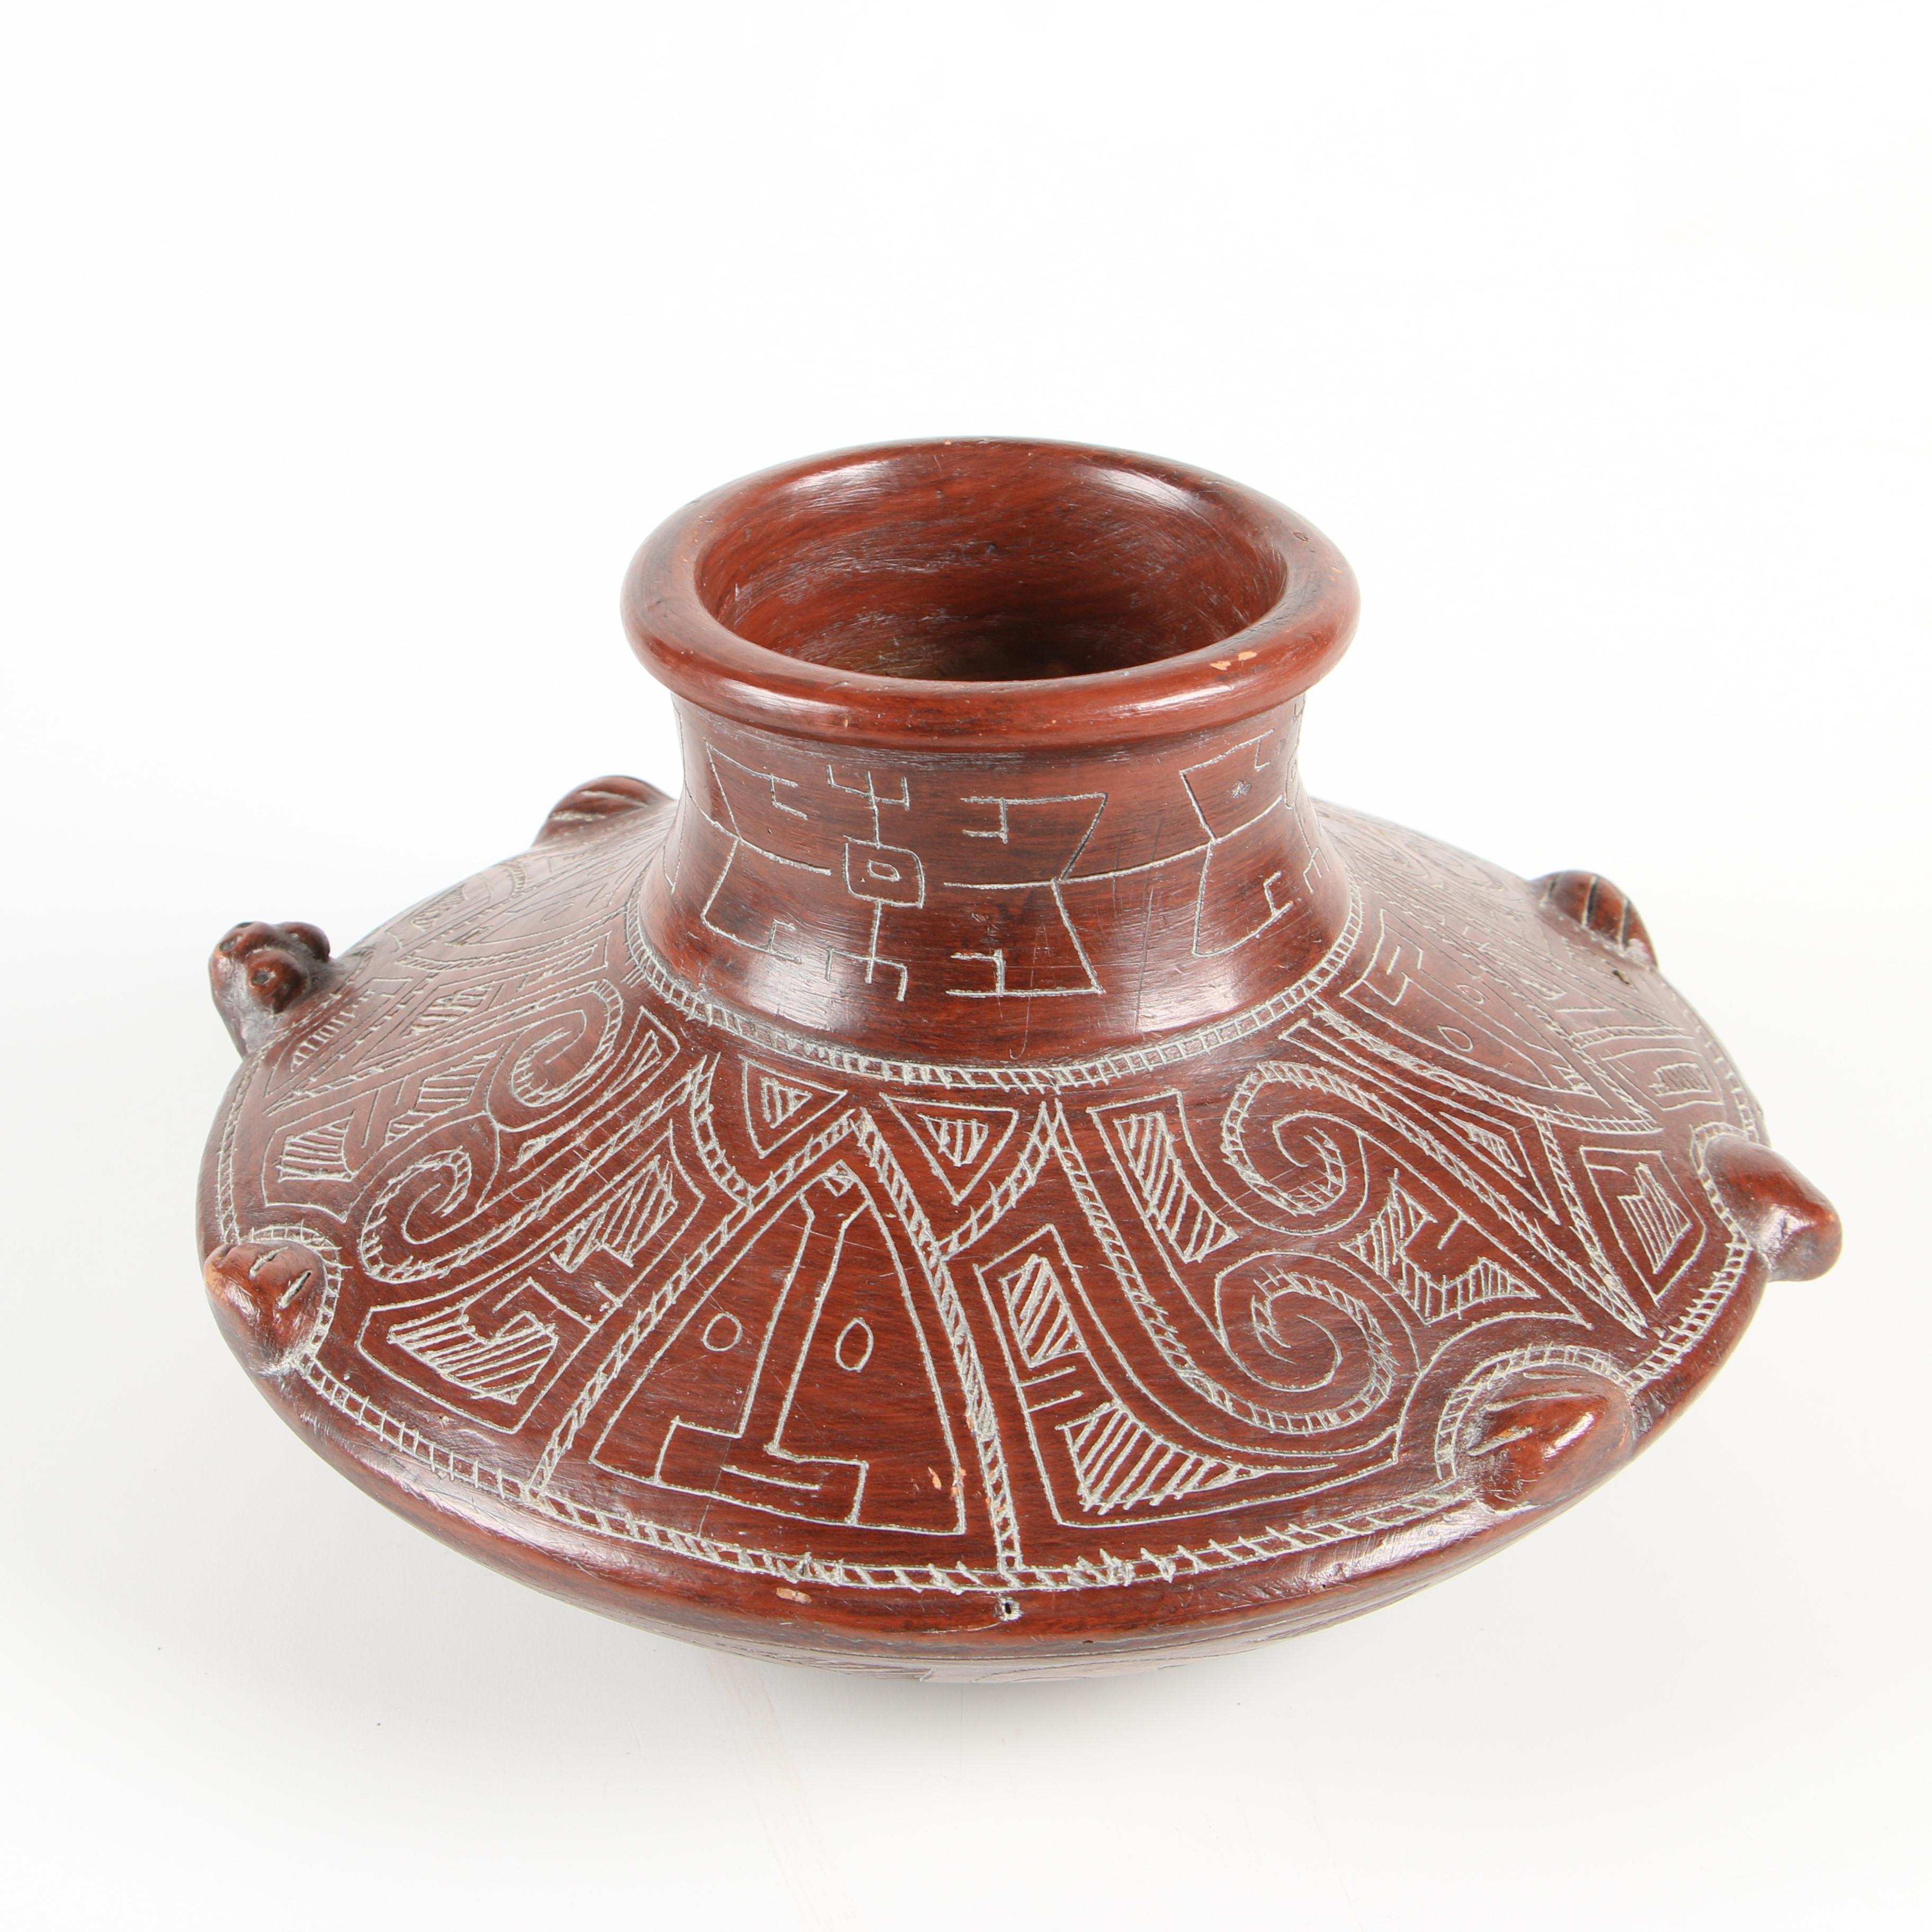 South American Style Sgraffito Earthenware Vase